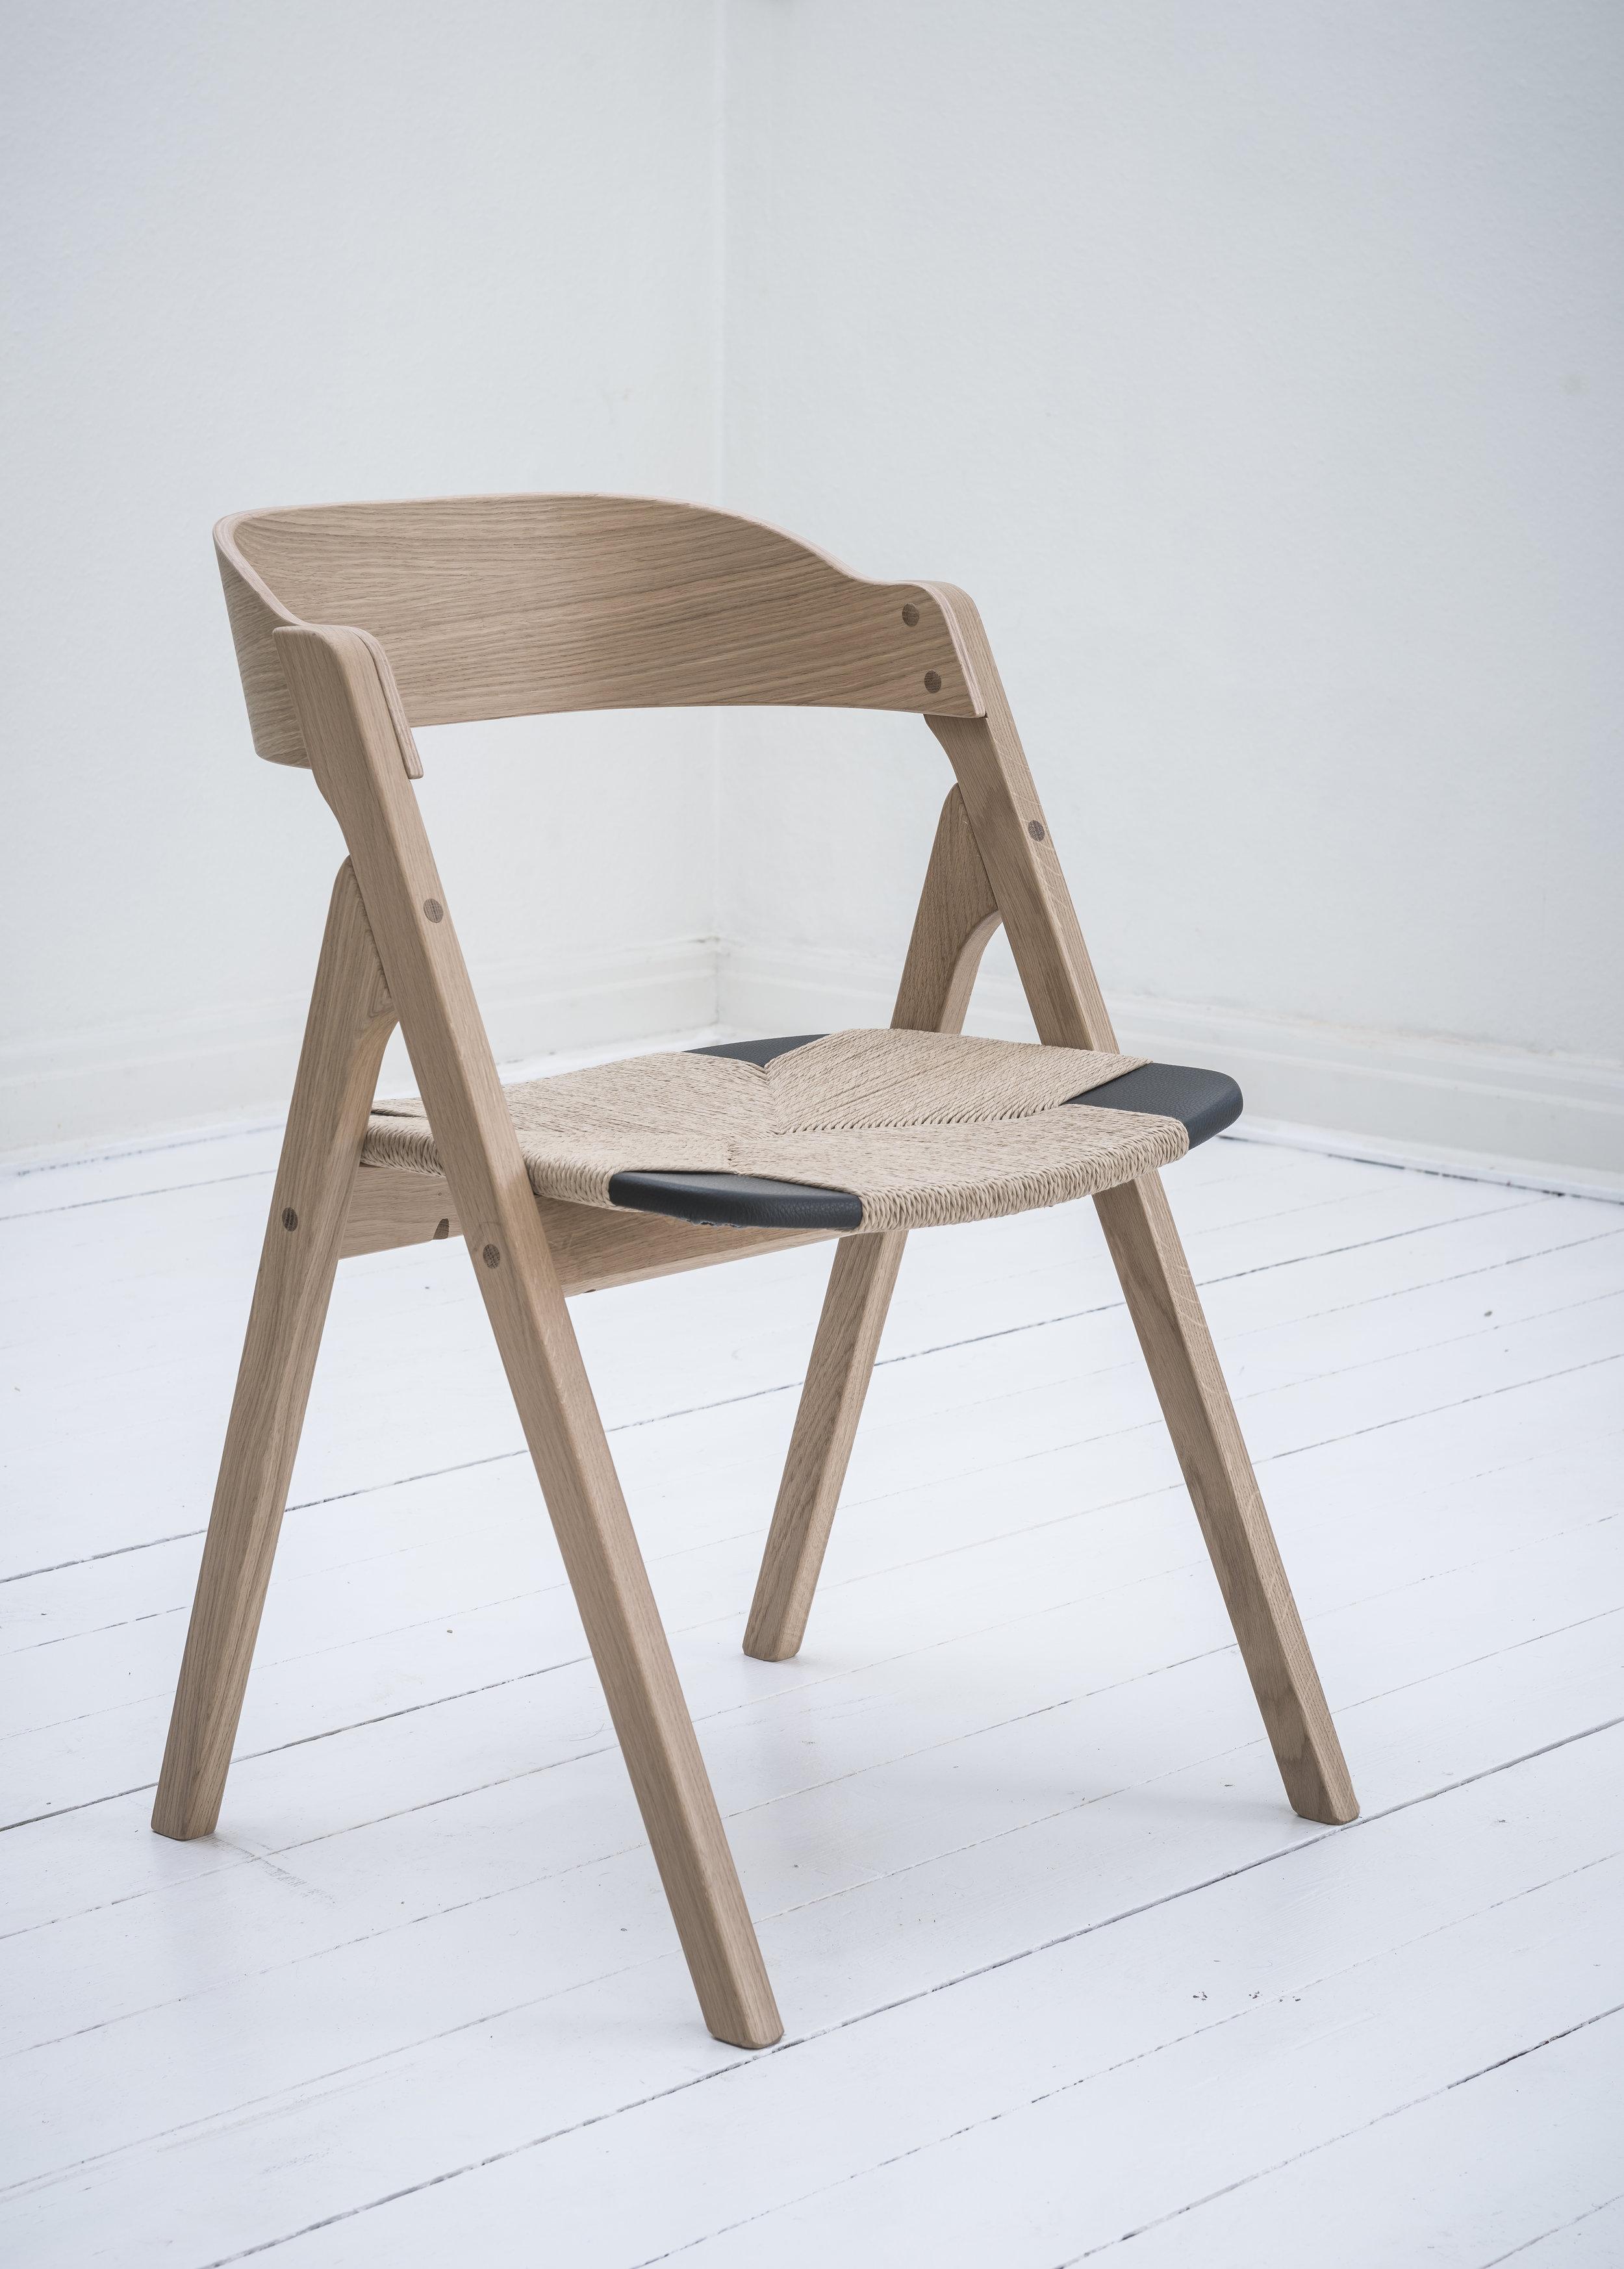 Dece hybrid eg sort sæde osmo 1.jpg